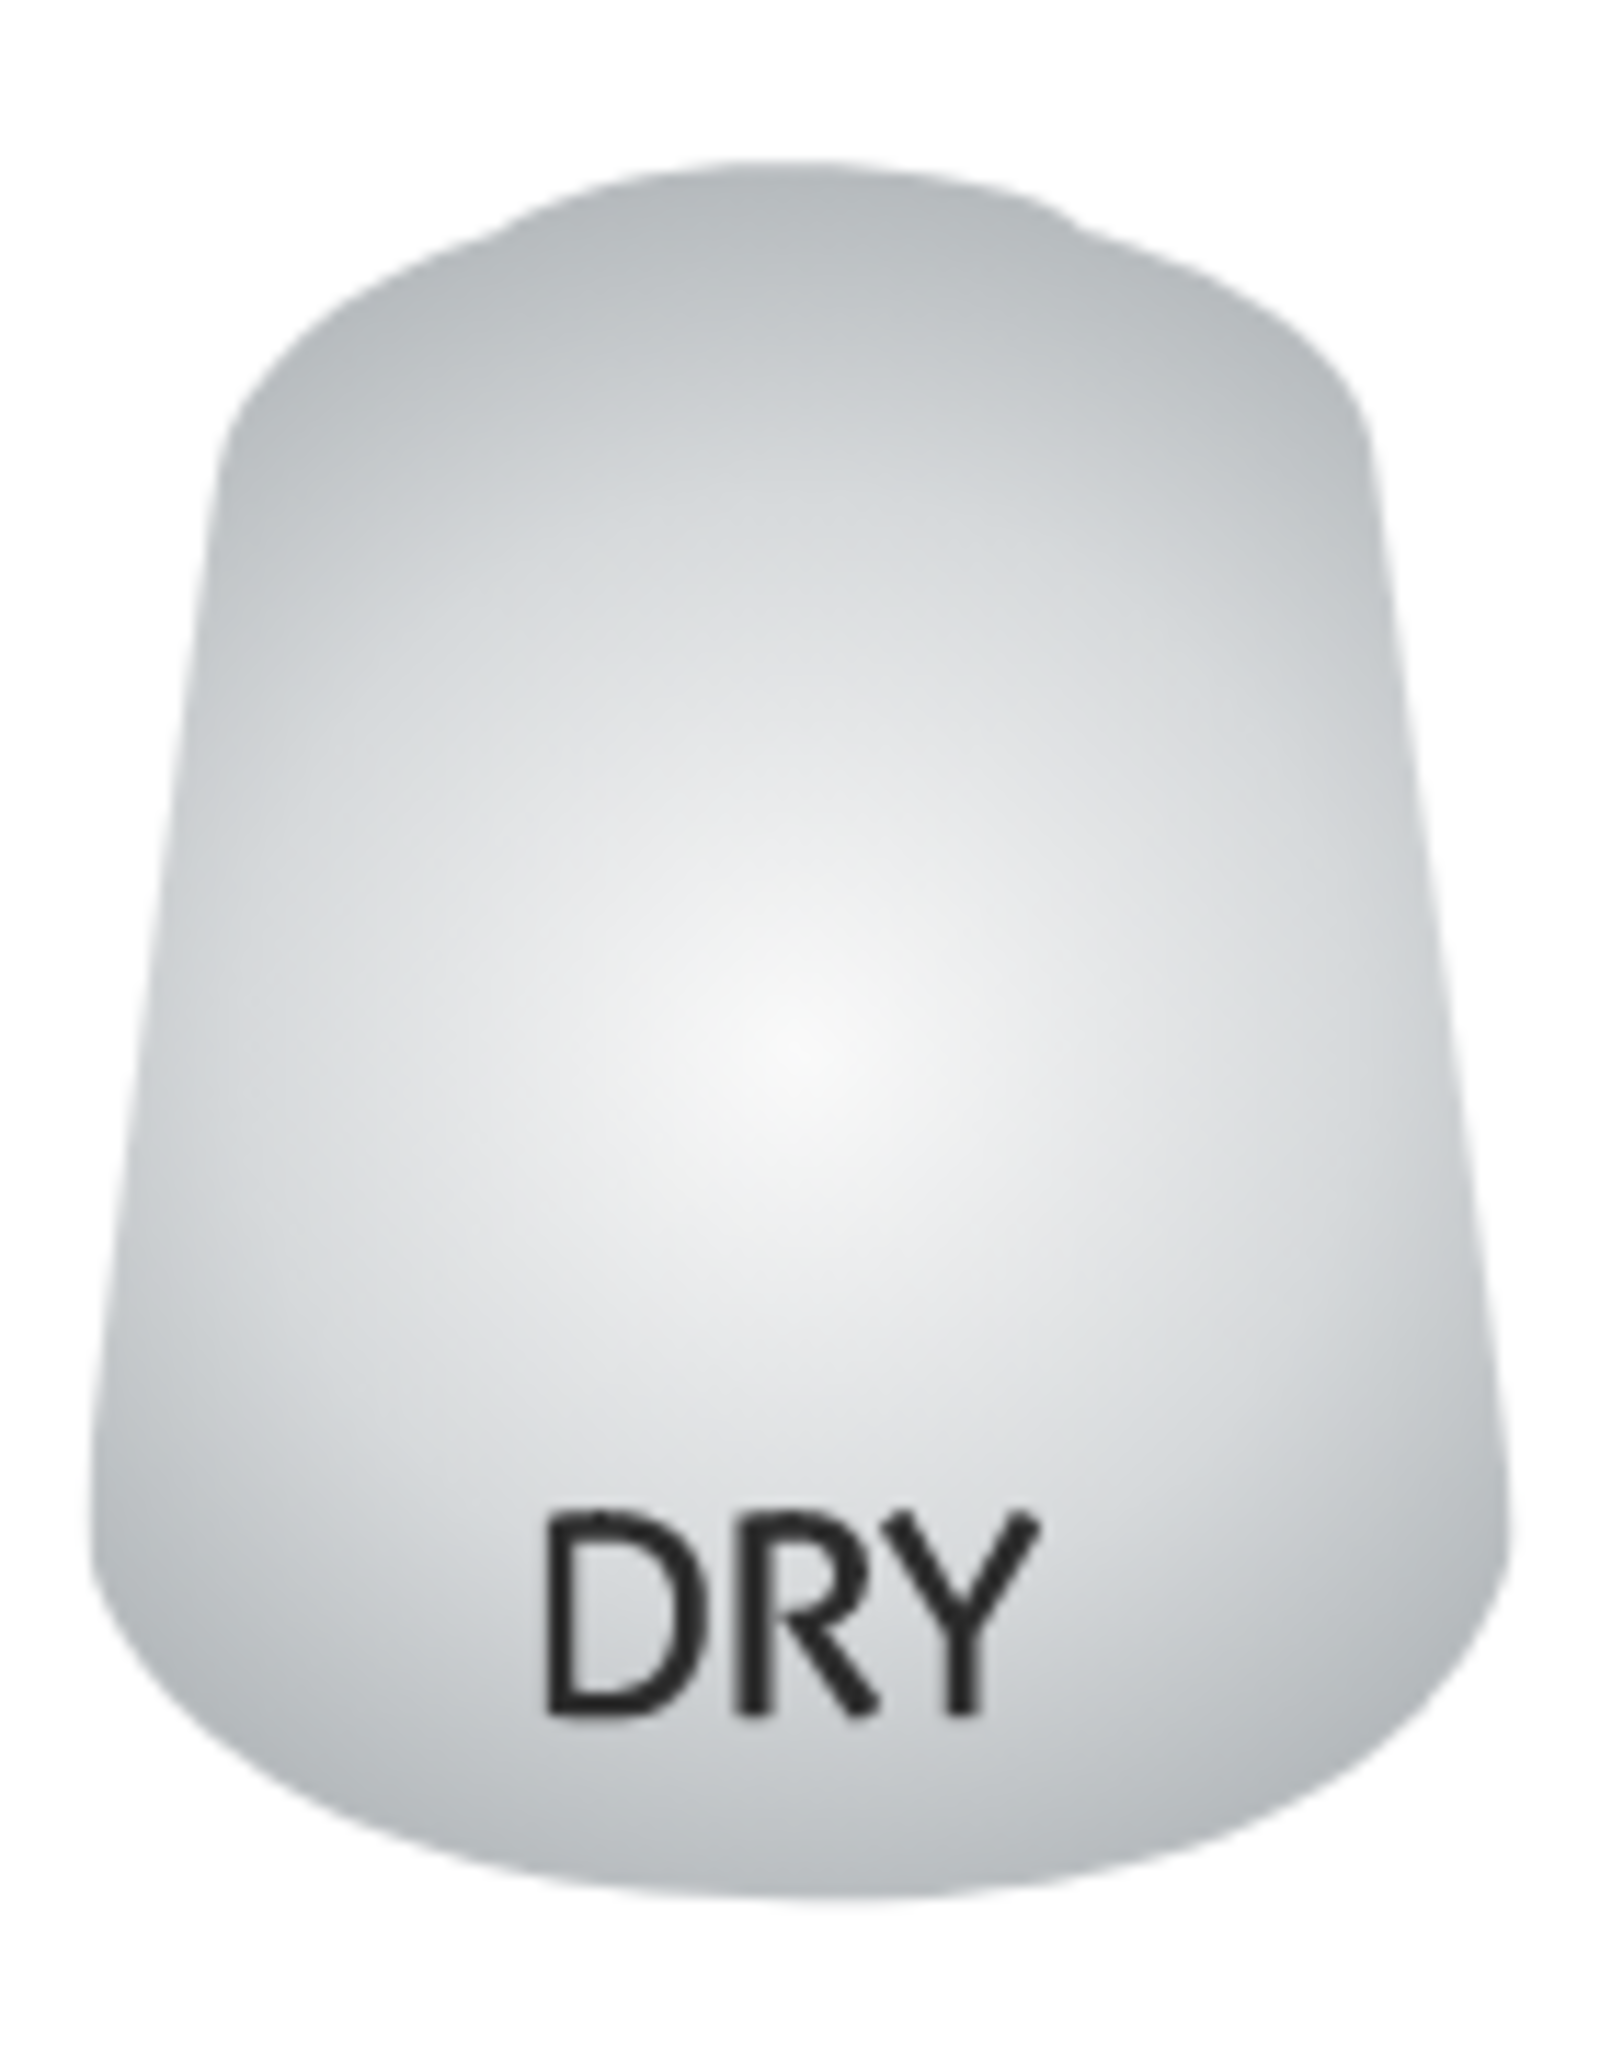 Games Workshop Citadel Dry Necron Compound